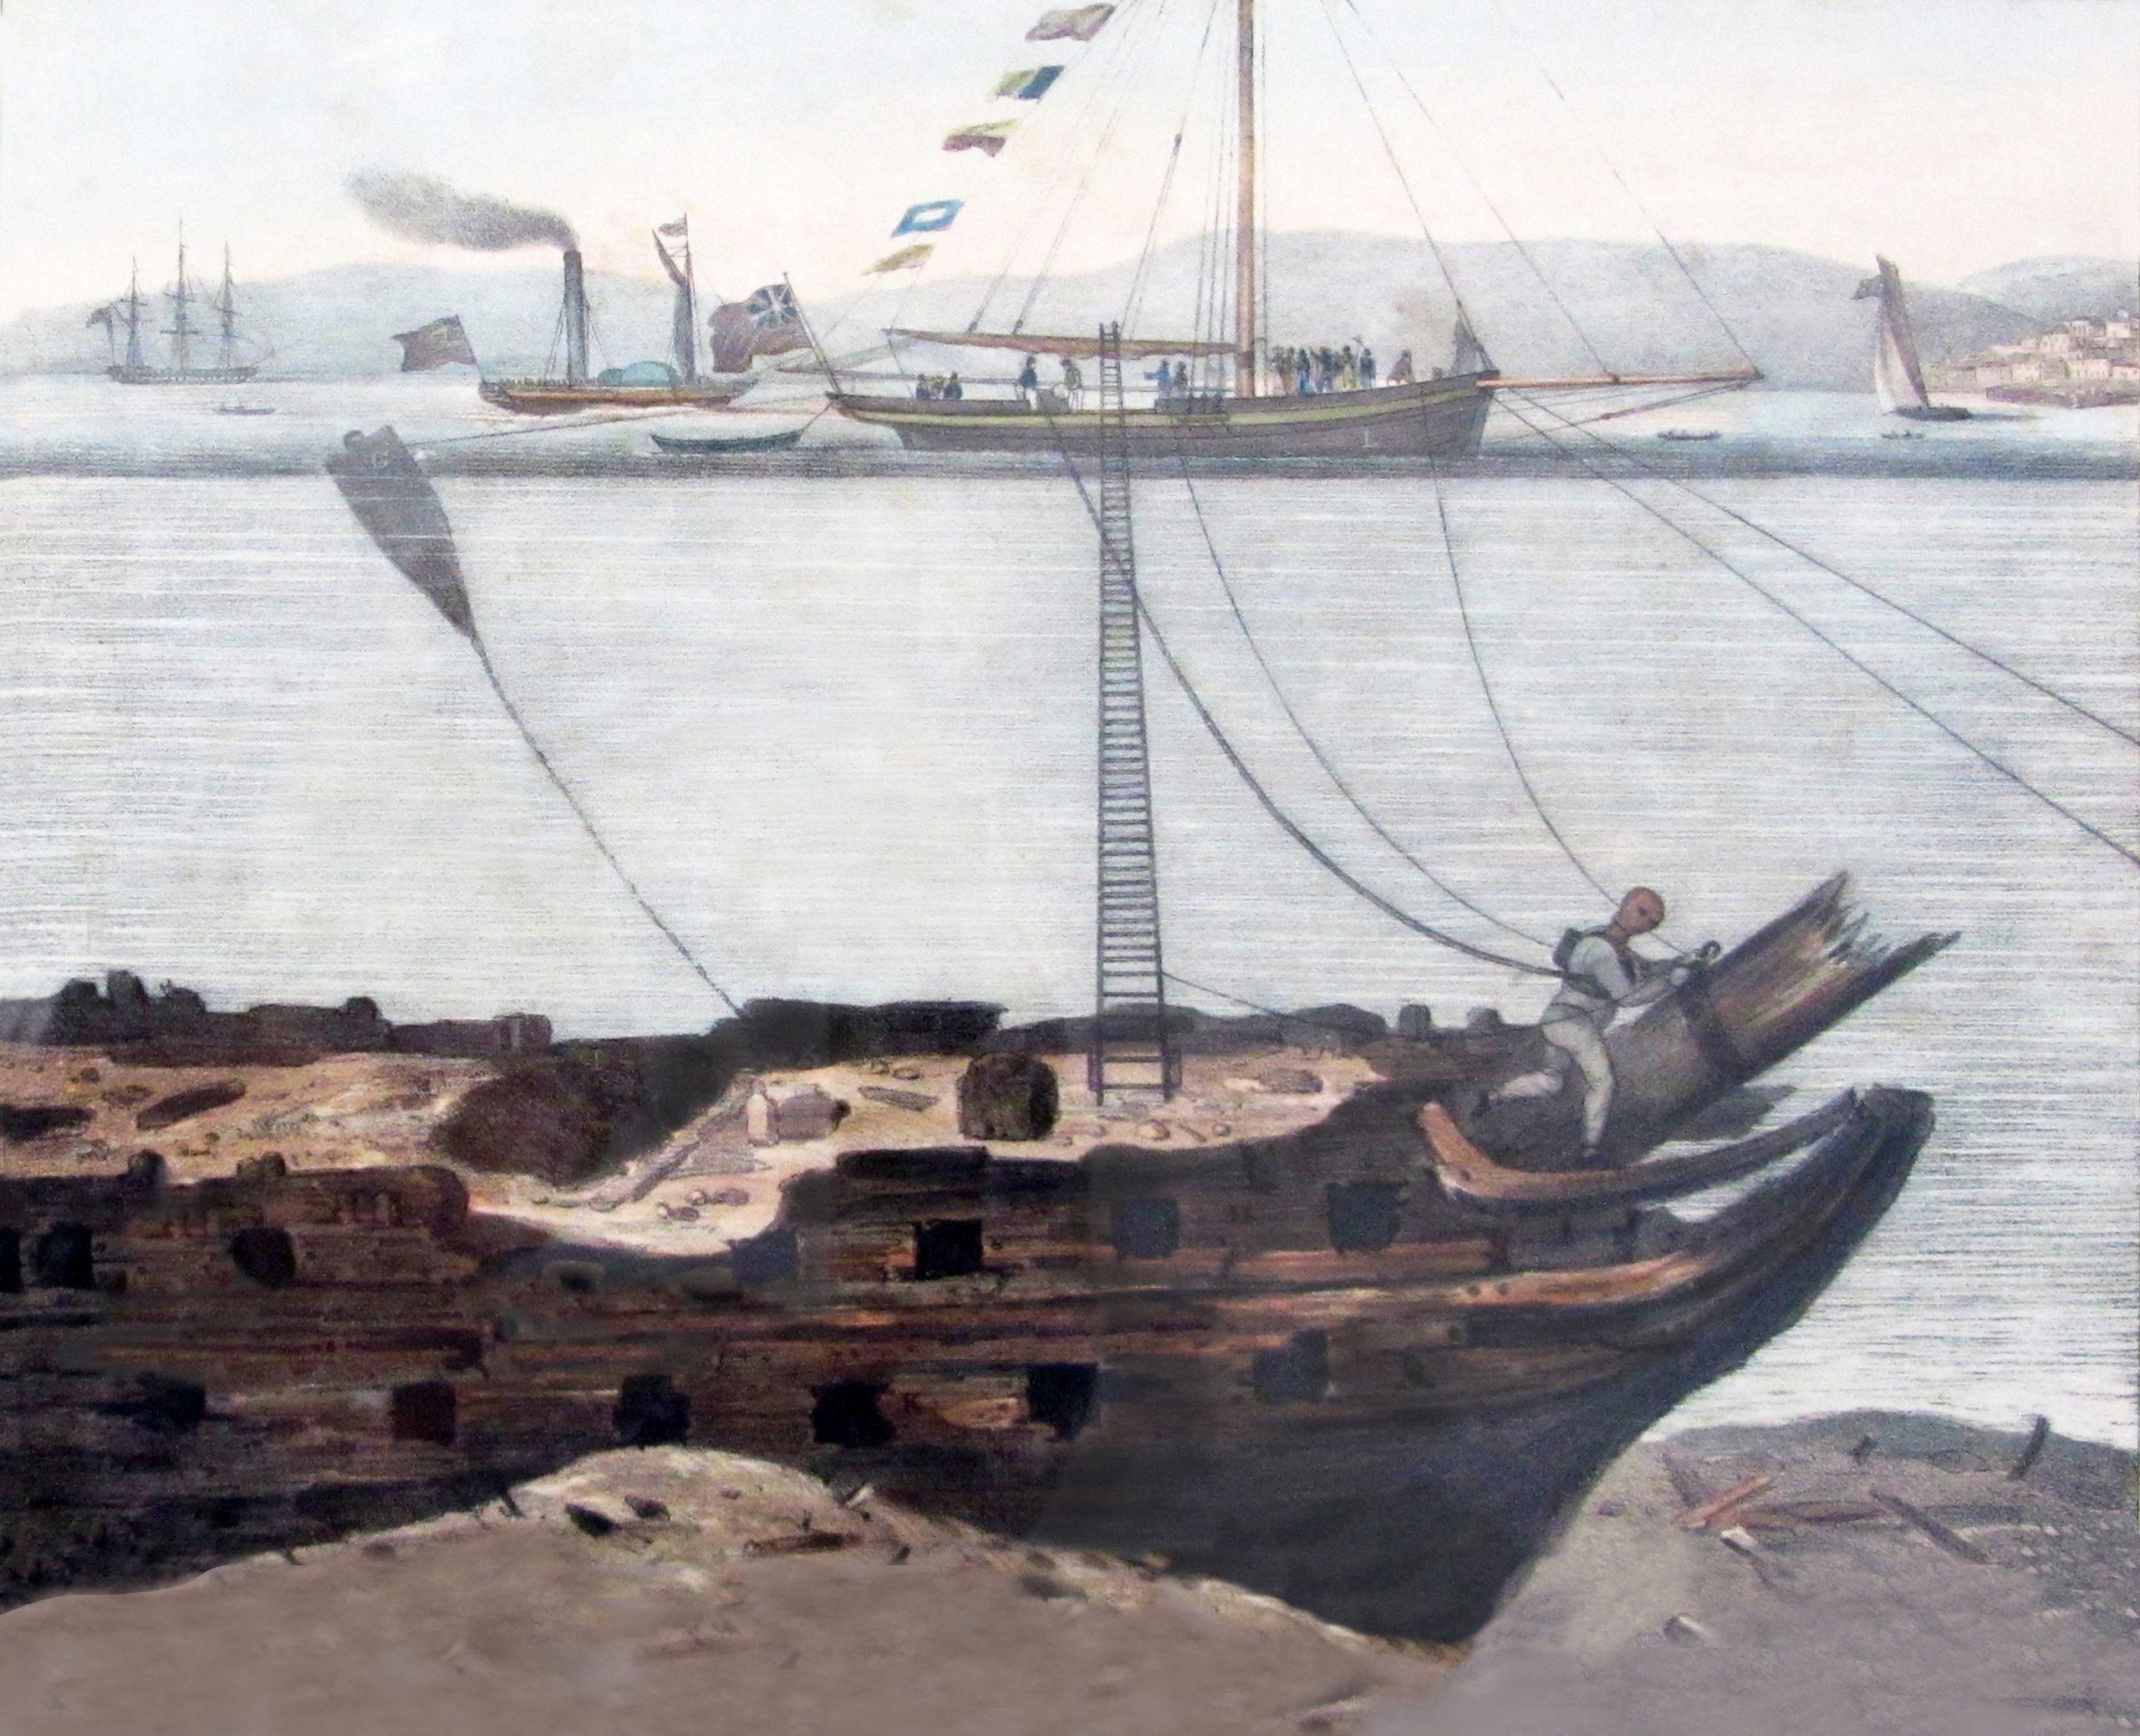 Gosport's Diving Heritage